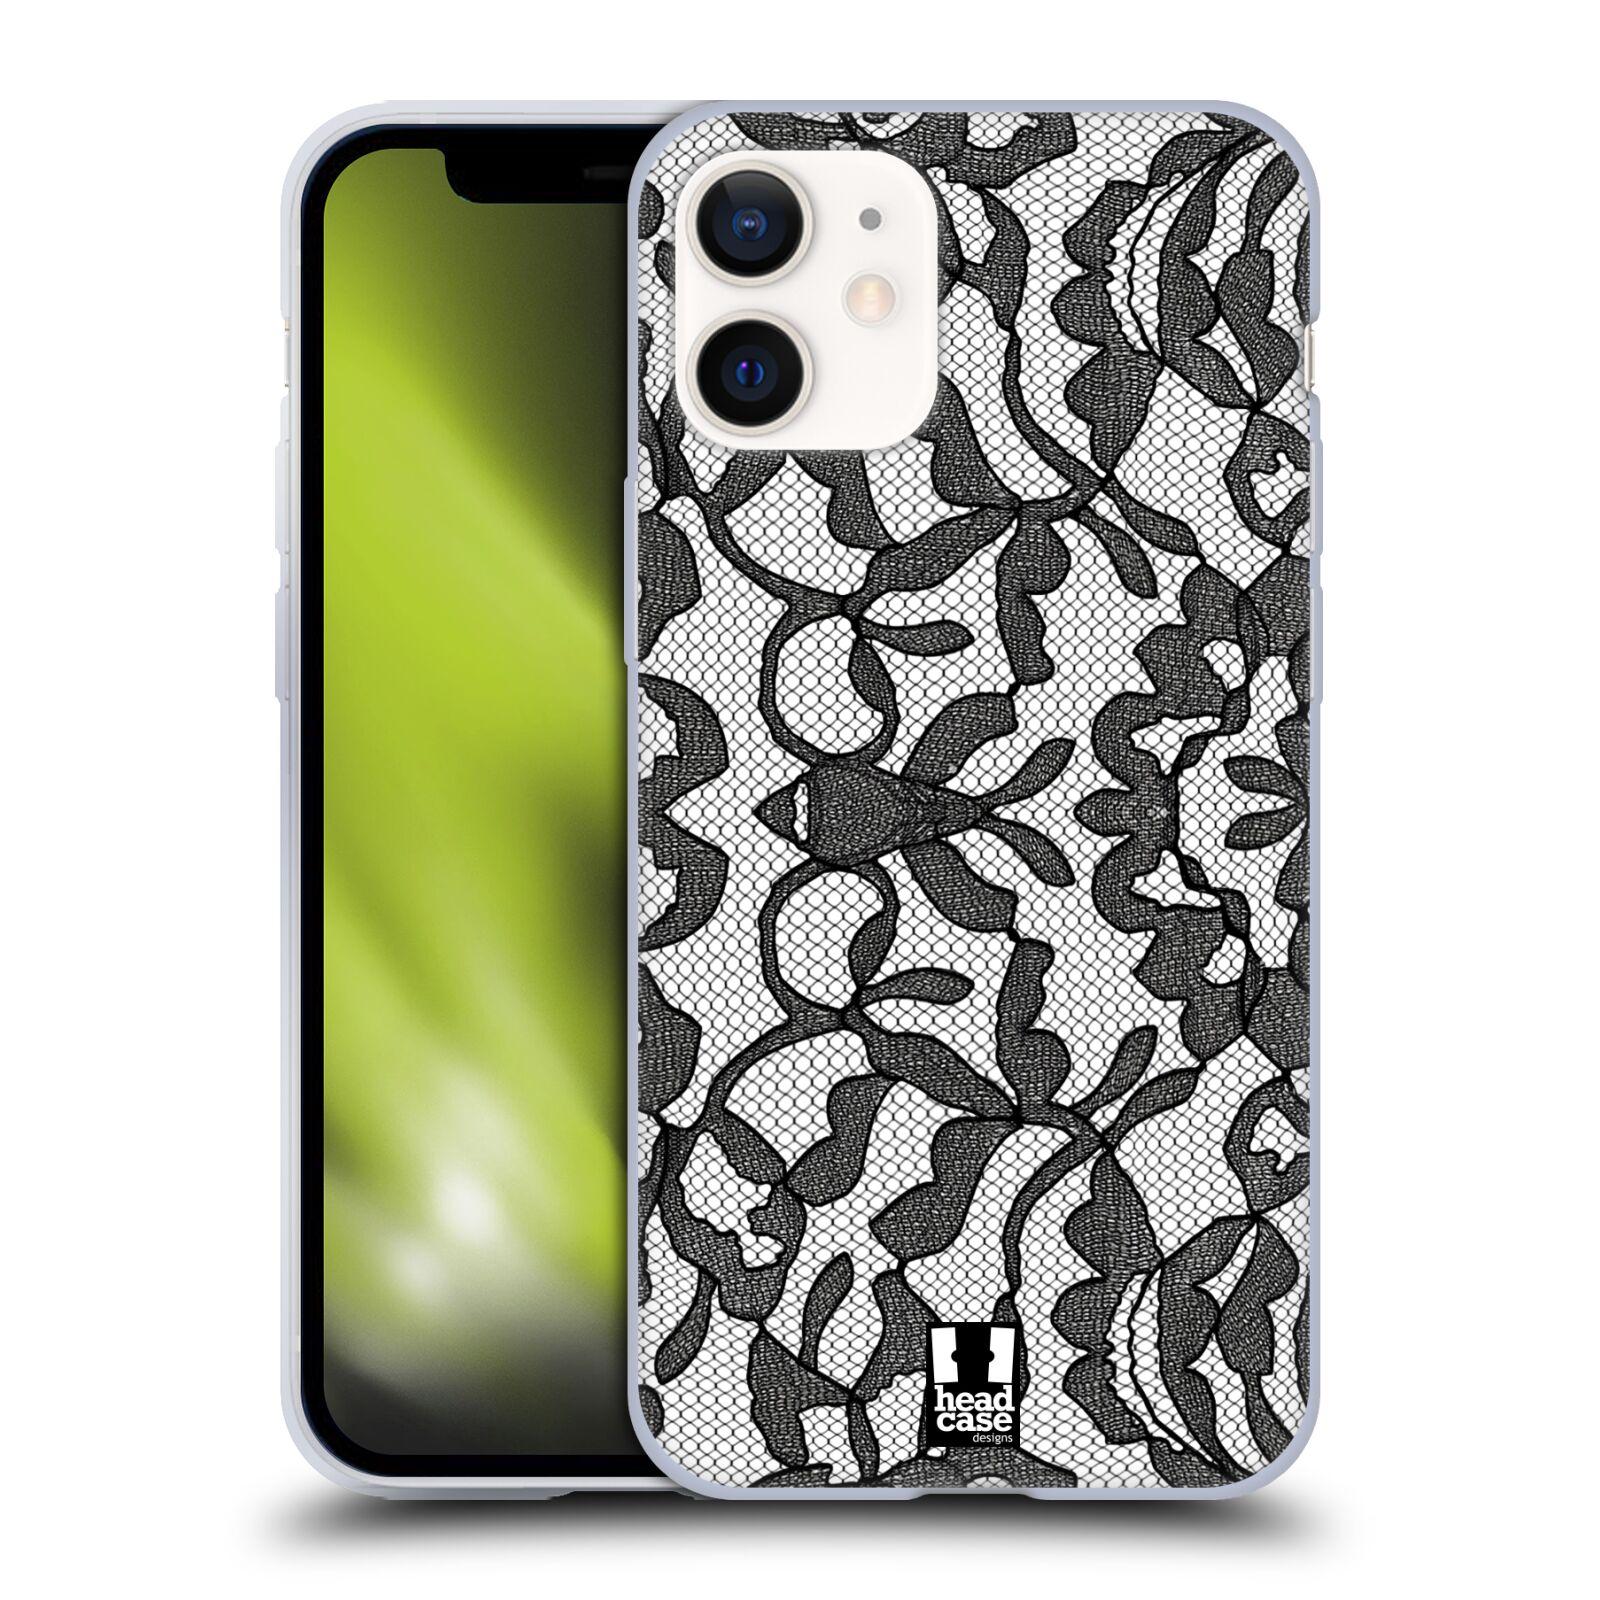 Silikonové pouzdro na mobil Apple iPhone 12 Mini - Head Case - LEAFY KRAJKA